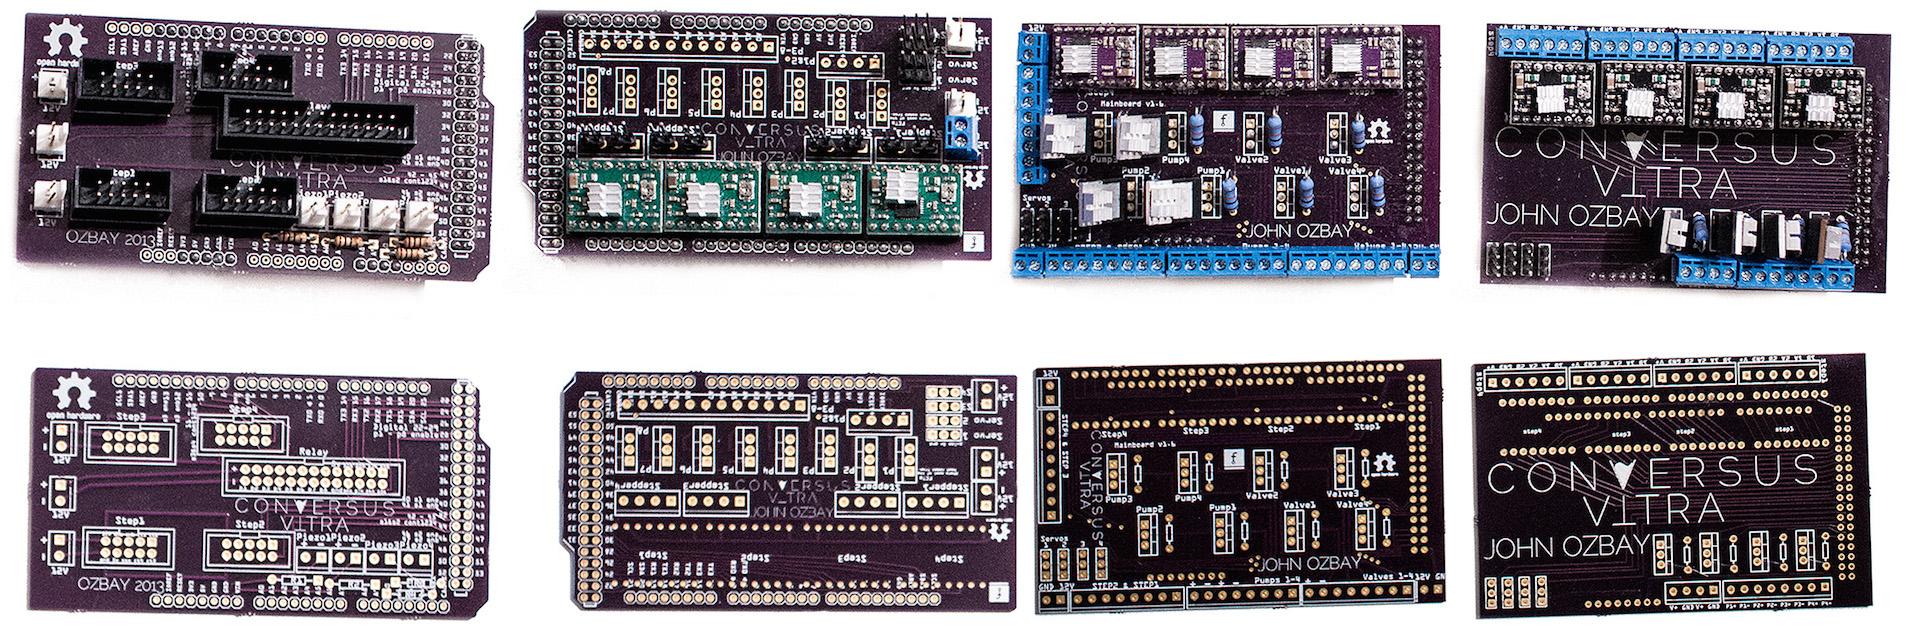 Conversus Vitra PCBs - John Ozbay